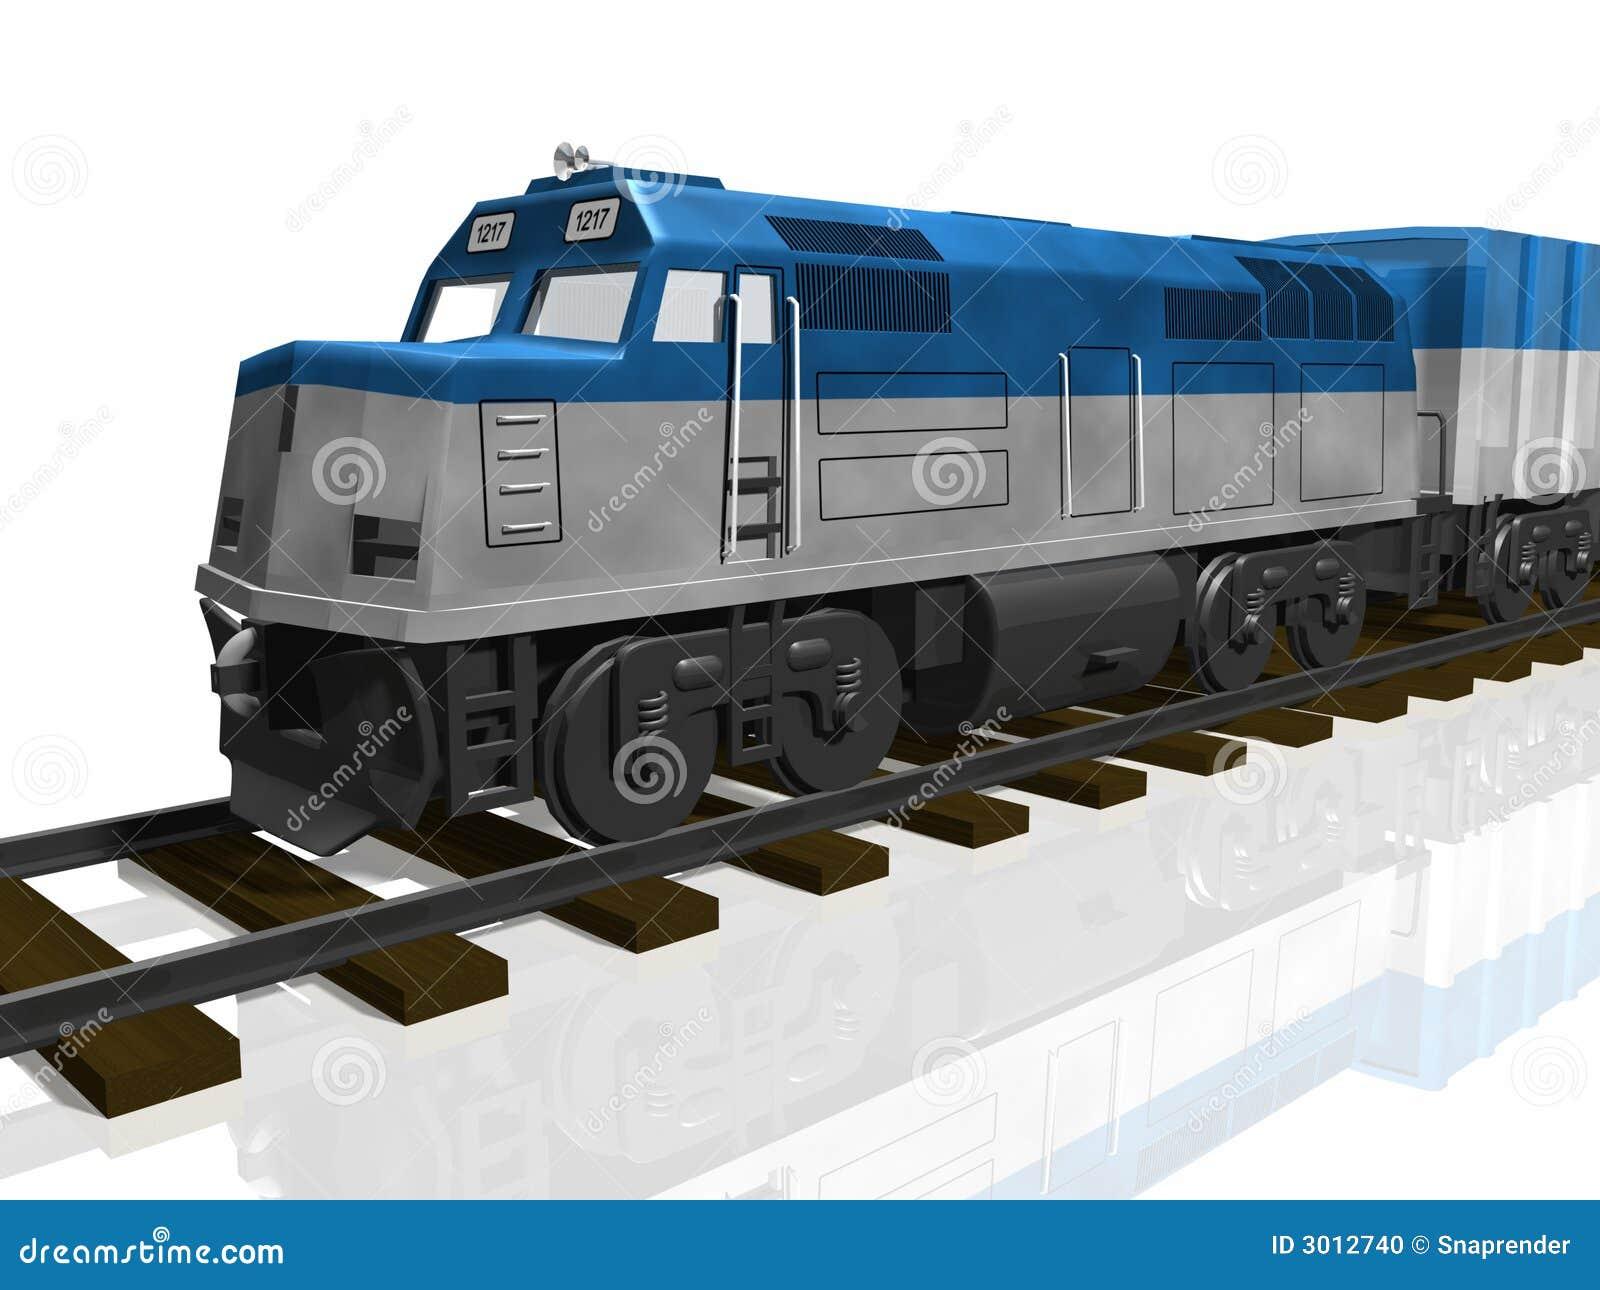 Levers Train Tracks O N : D train on tracks isolated stock illustration